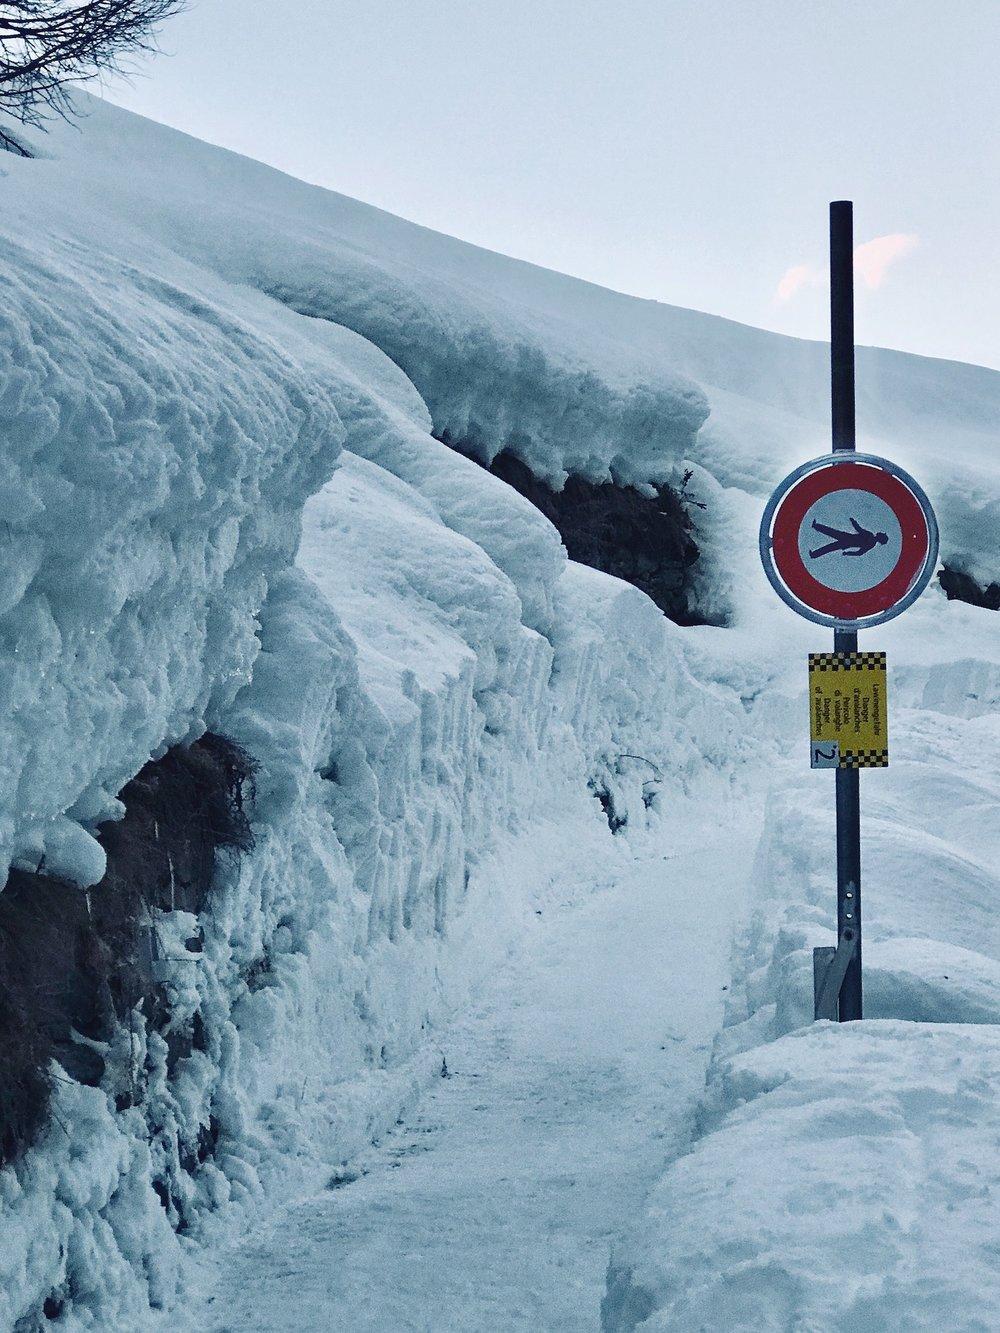 Warning Sign on Hike, Zermatt.